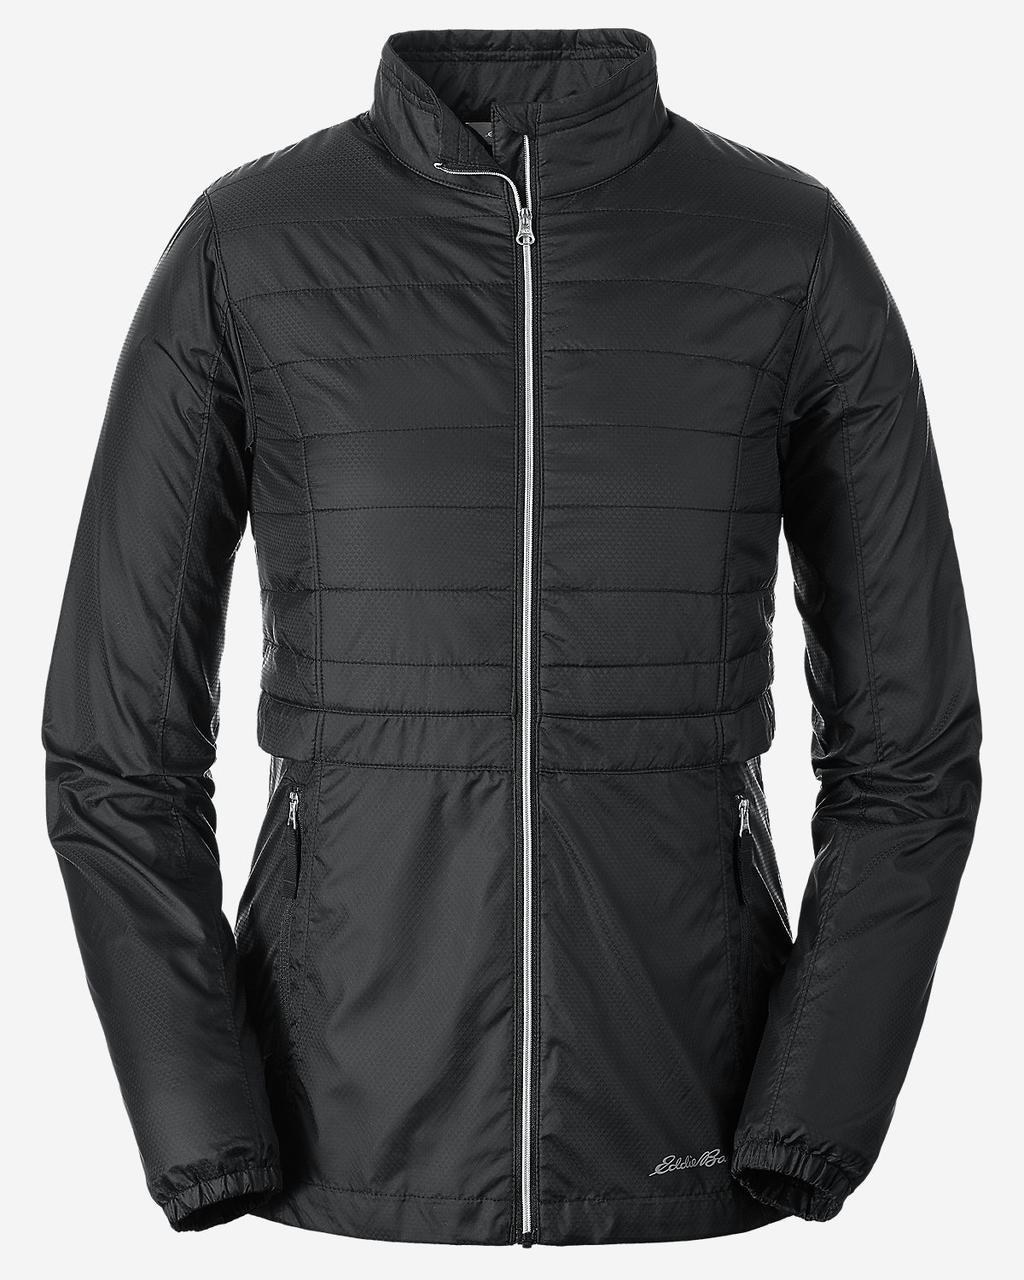 Демисезонная женская куртка Eddie Bauer Womens Selene Jacket Black